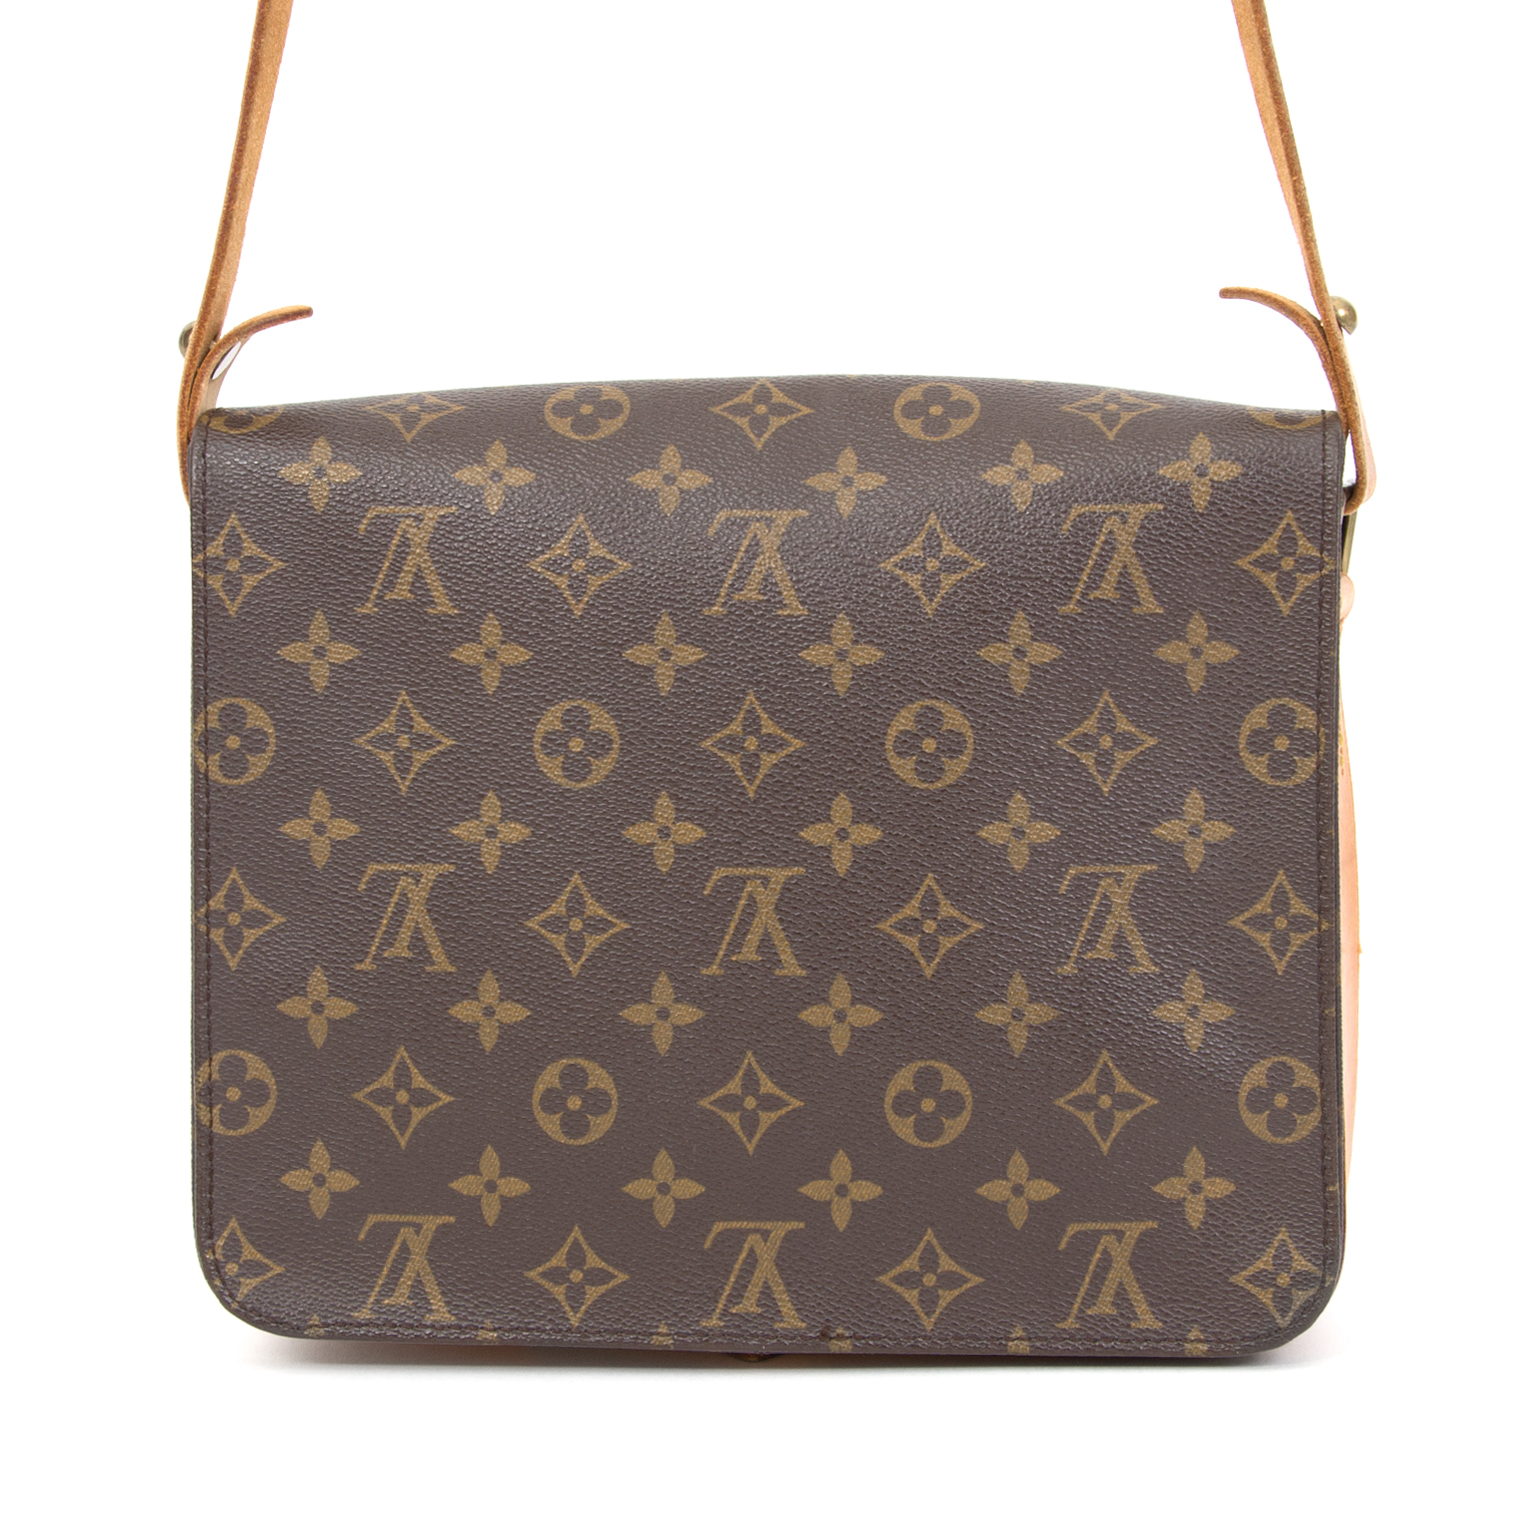 9dff068cec9e ... Louis Vuitton Cartouchière Monogram Canvas Shoulder Bag buy sell resell  online webshop international shipping